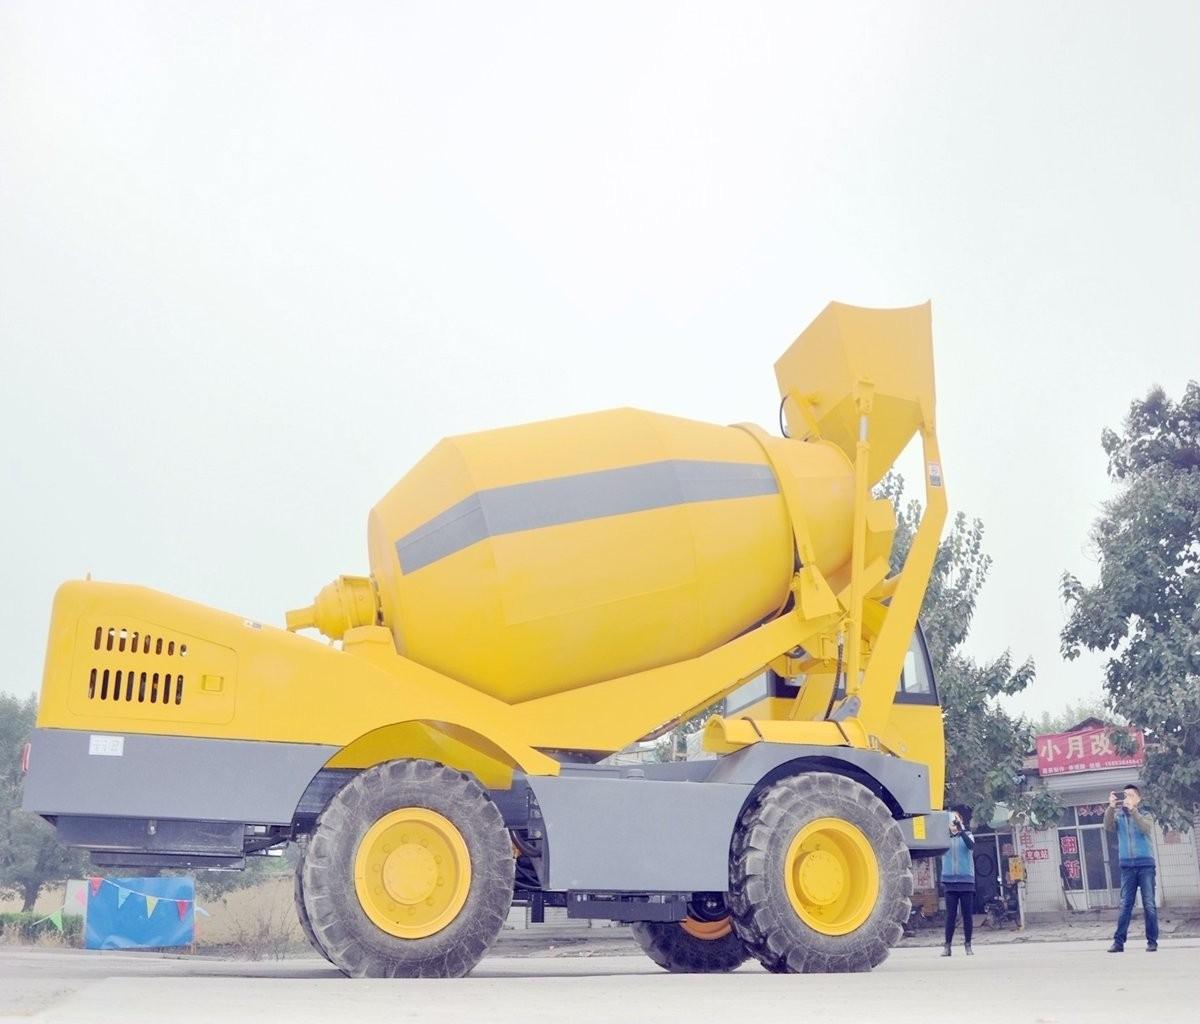 Sales 4.M3 Bratch Self-loading Concrete Mixer, Buy 4.M3 Bratch Self-loading Concrete Mixer, 4.M3 Bratch Self-loading Concrete Mixer Factory, 4.M3 Bratch Self-loading Concrete Mixer Brands